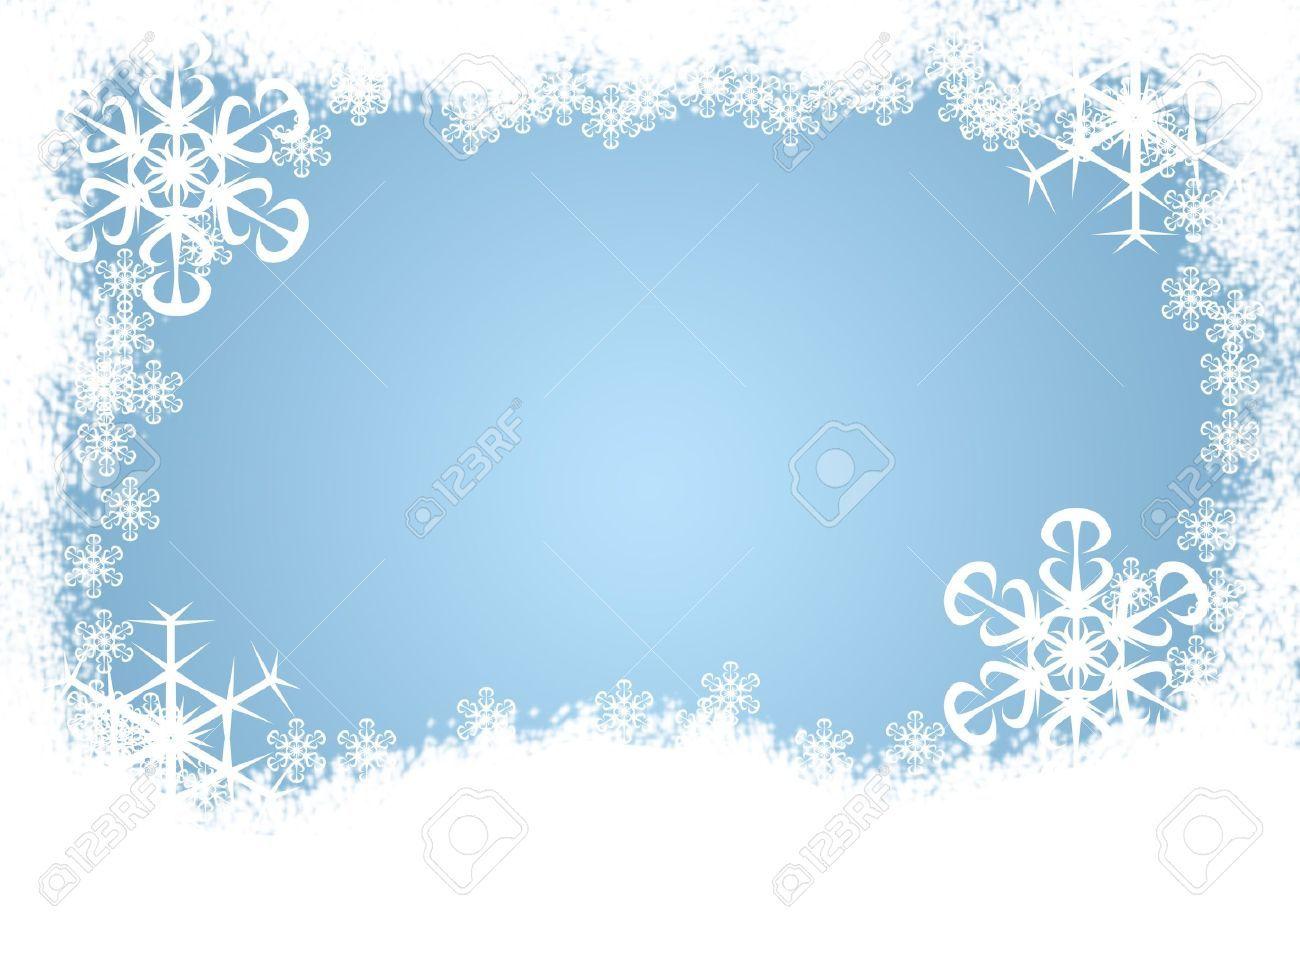 Snow border clipart free 2 » Clipart Portal.